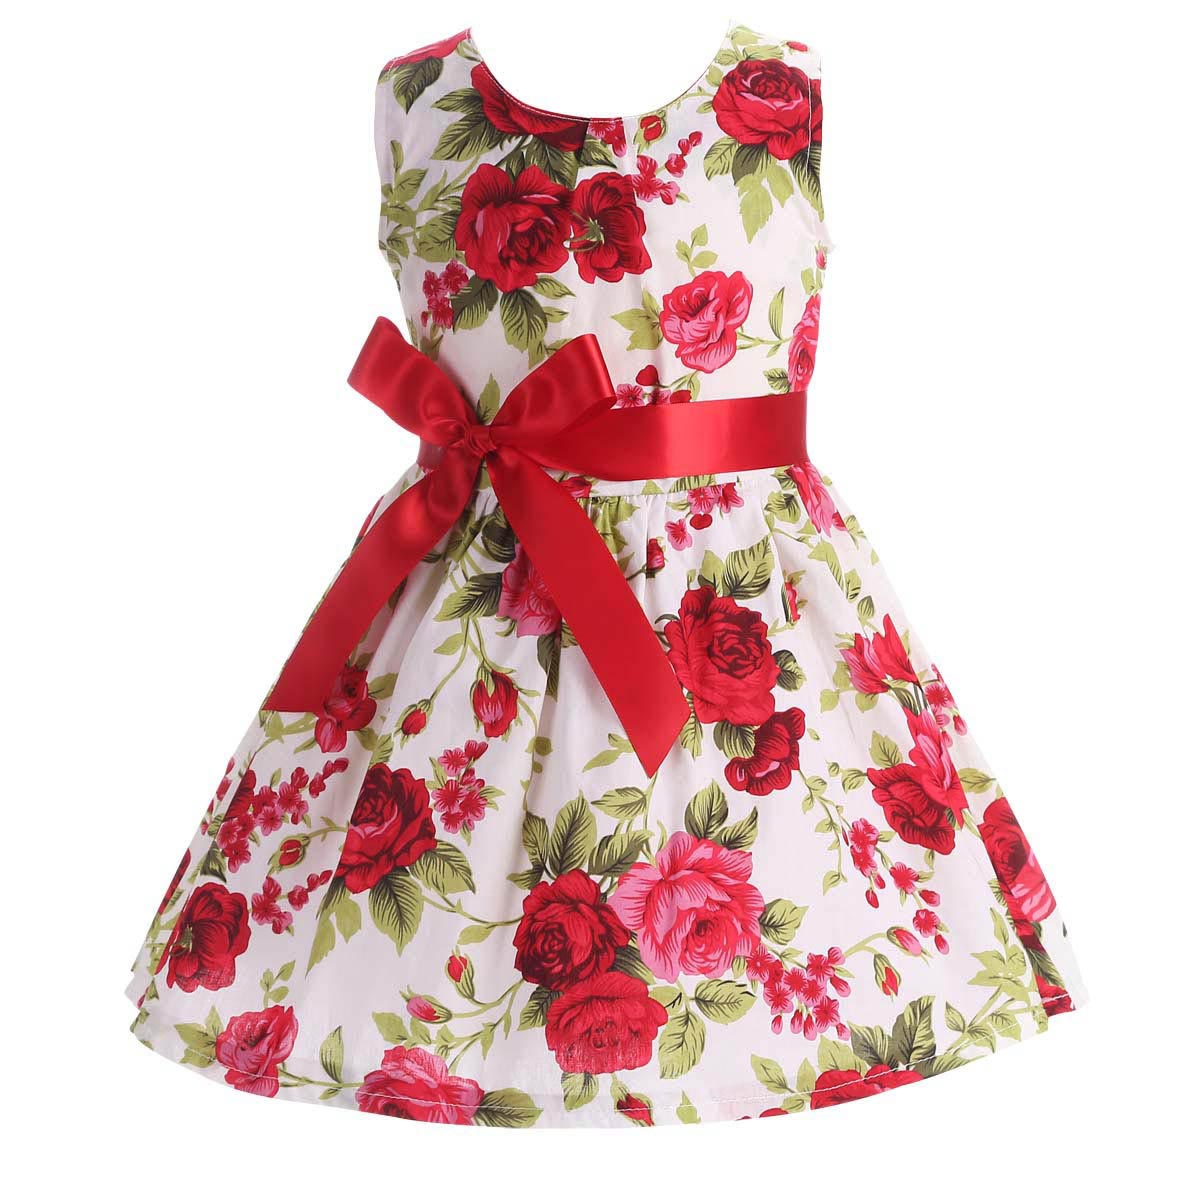 Floral Children Baby Dresses Girl Wedding Party Princess 1 Year Birthday Girls  Dress Cotton Summer 2017 Teenage Vestido Infantil 99cb9e5e91b3